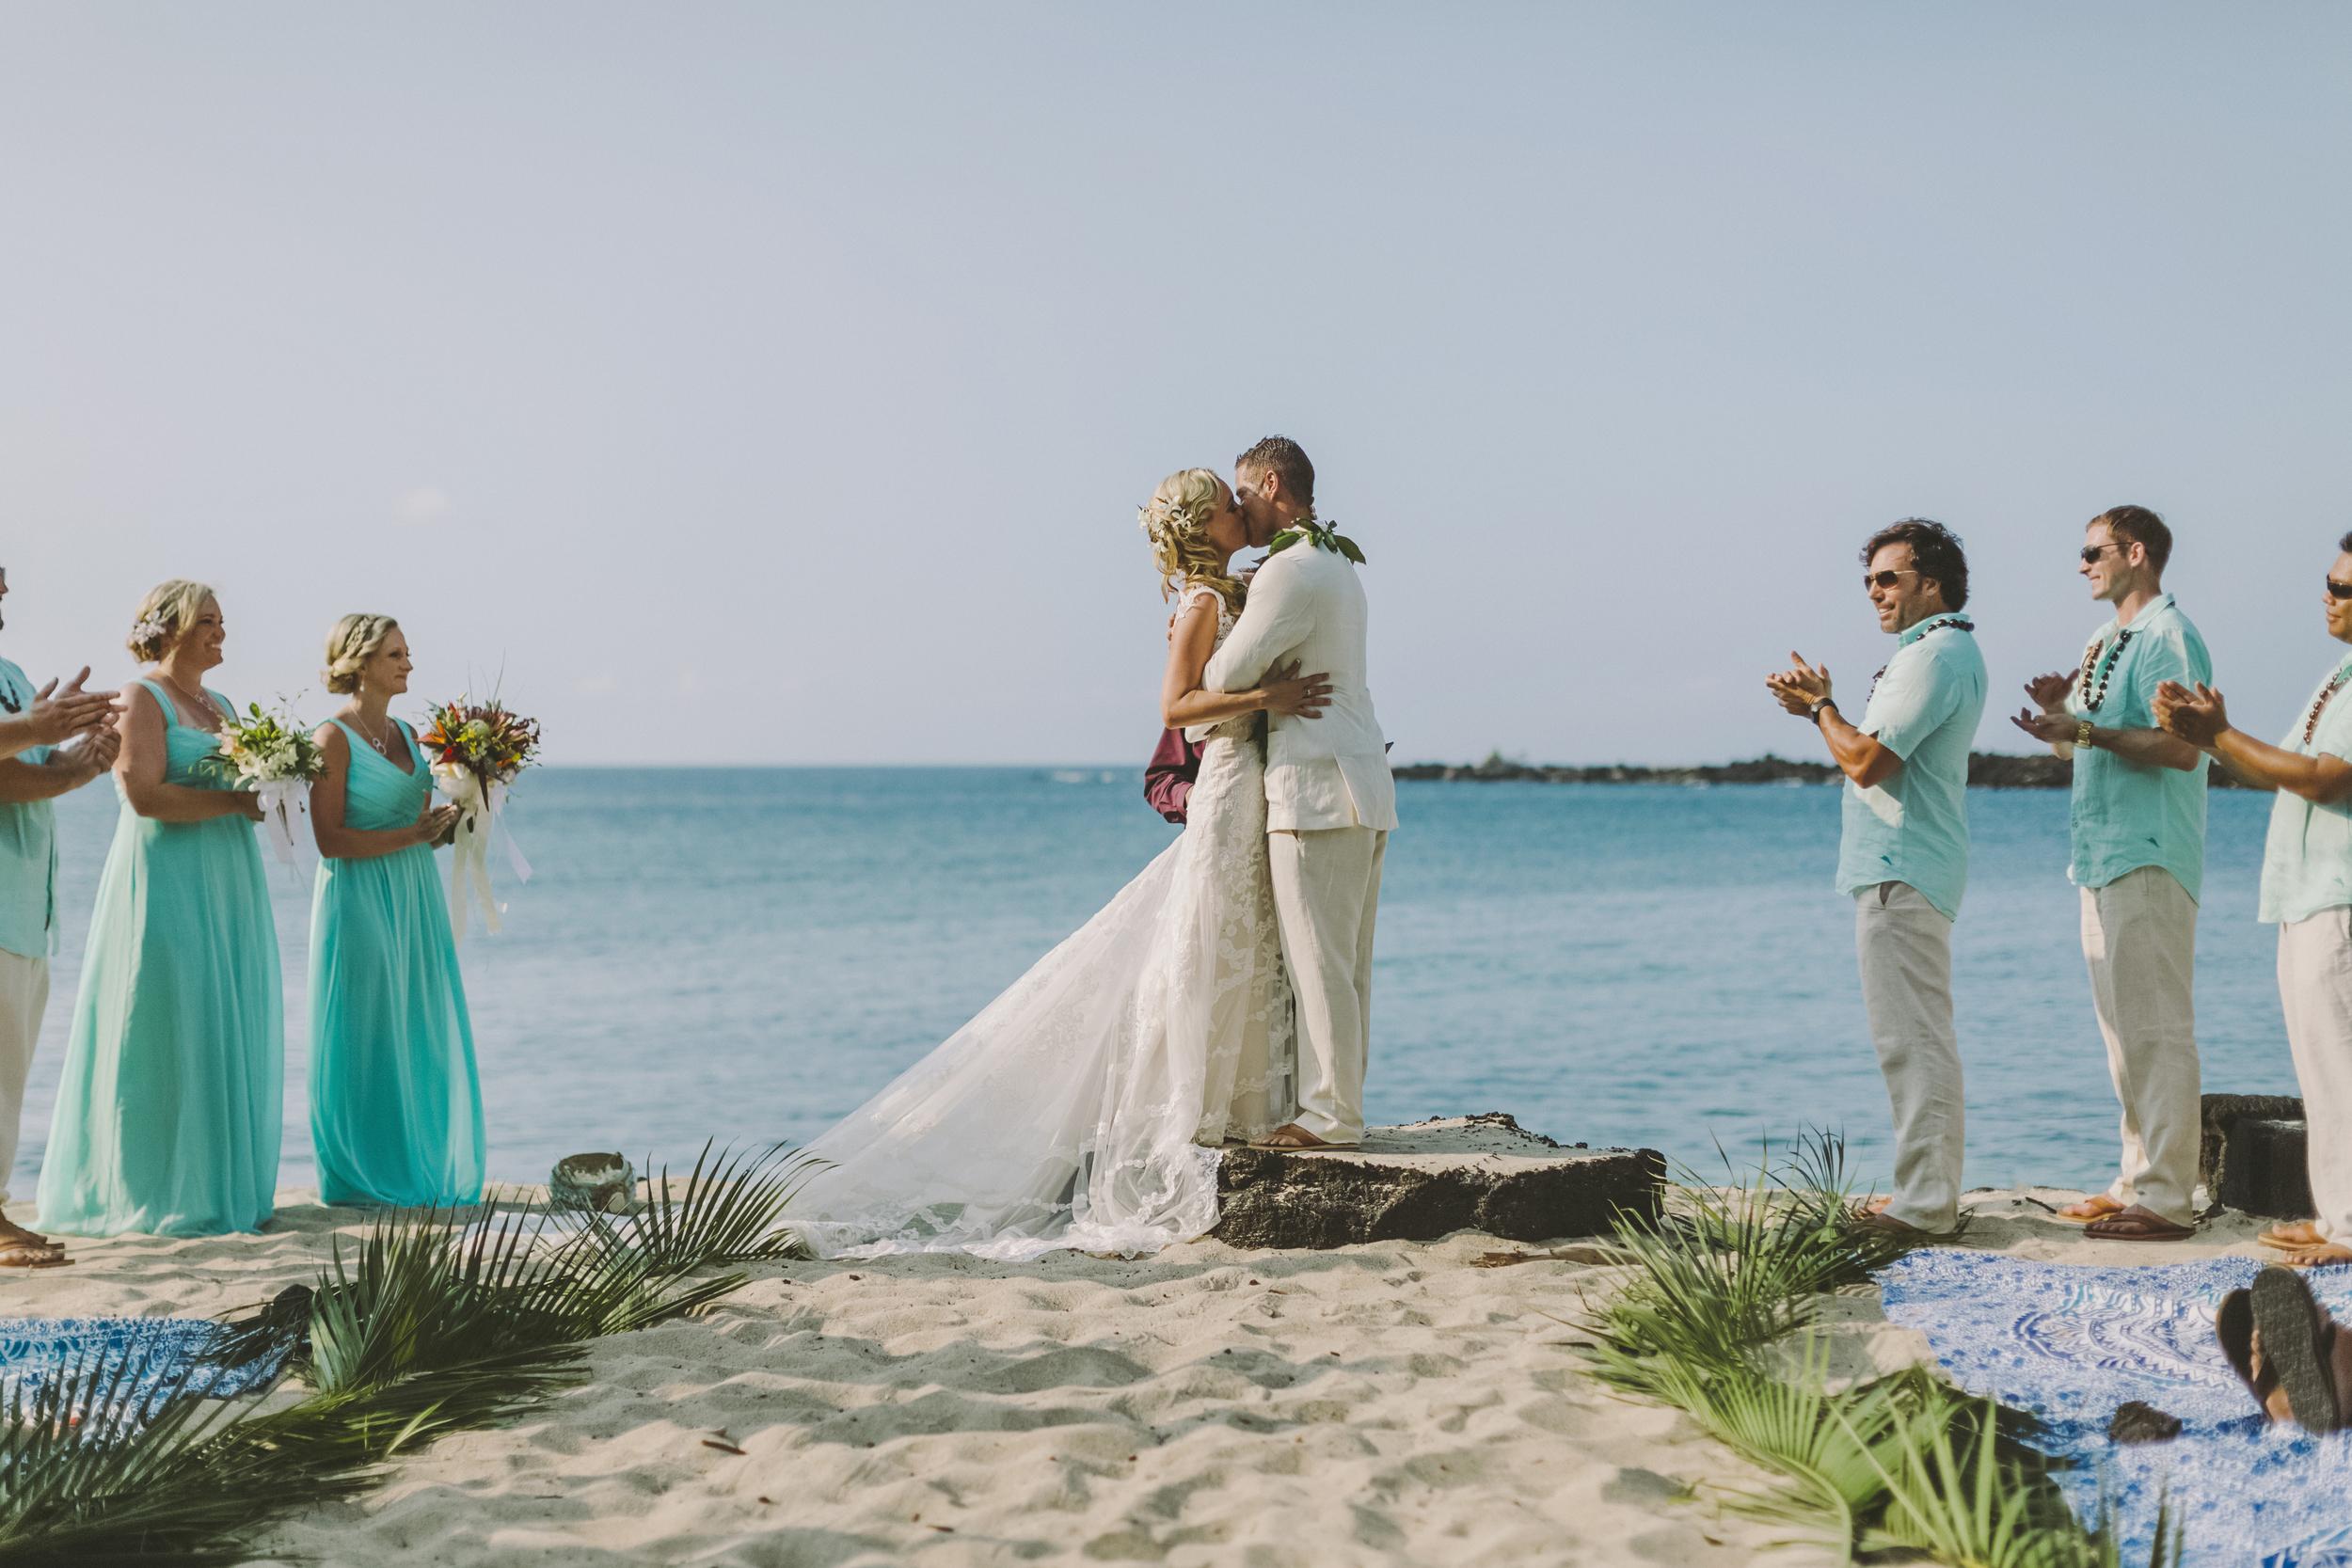 angie-diaz-photography-hawaii-wedding-photographer-kelli-jay-78.jpg